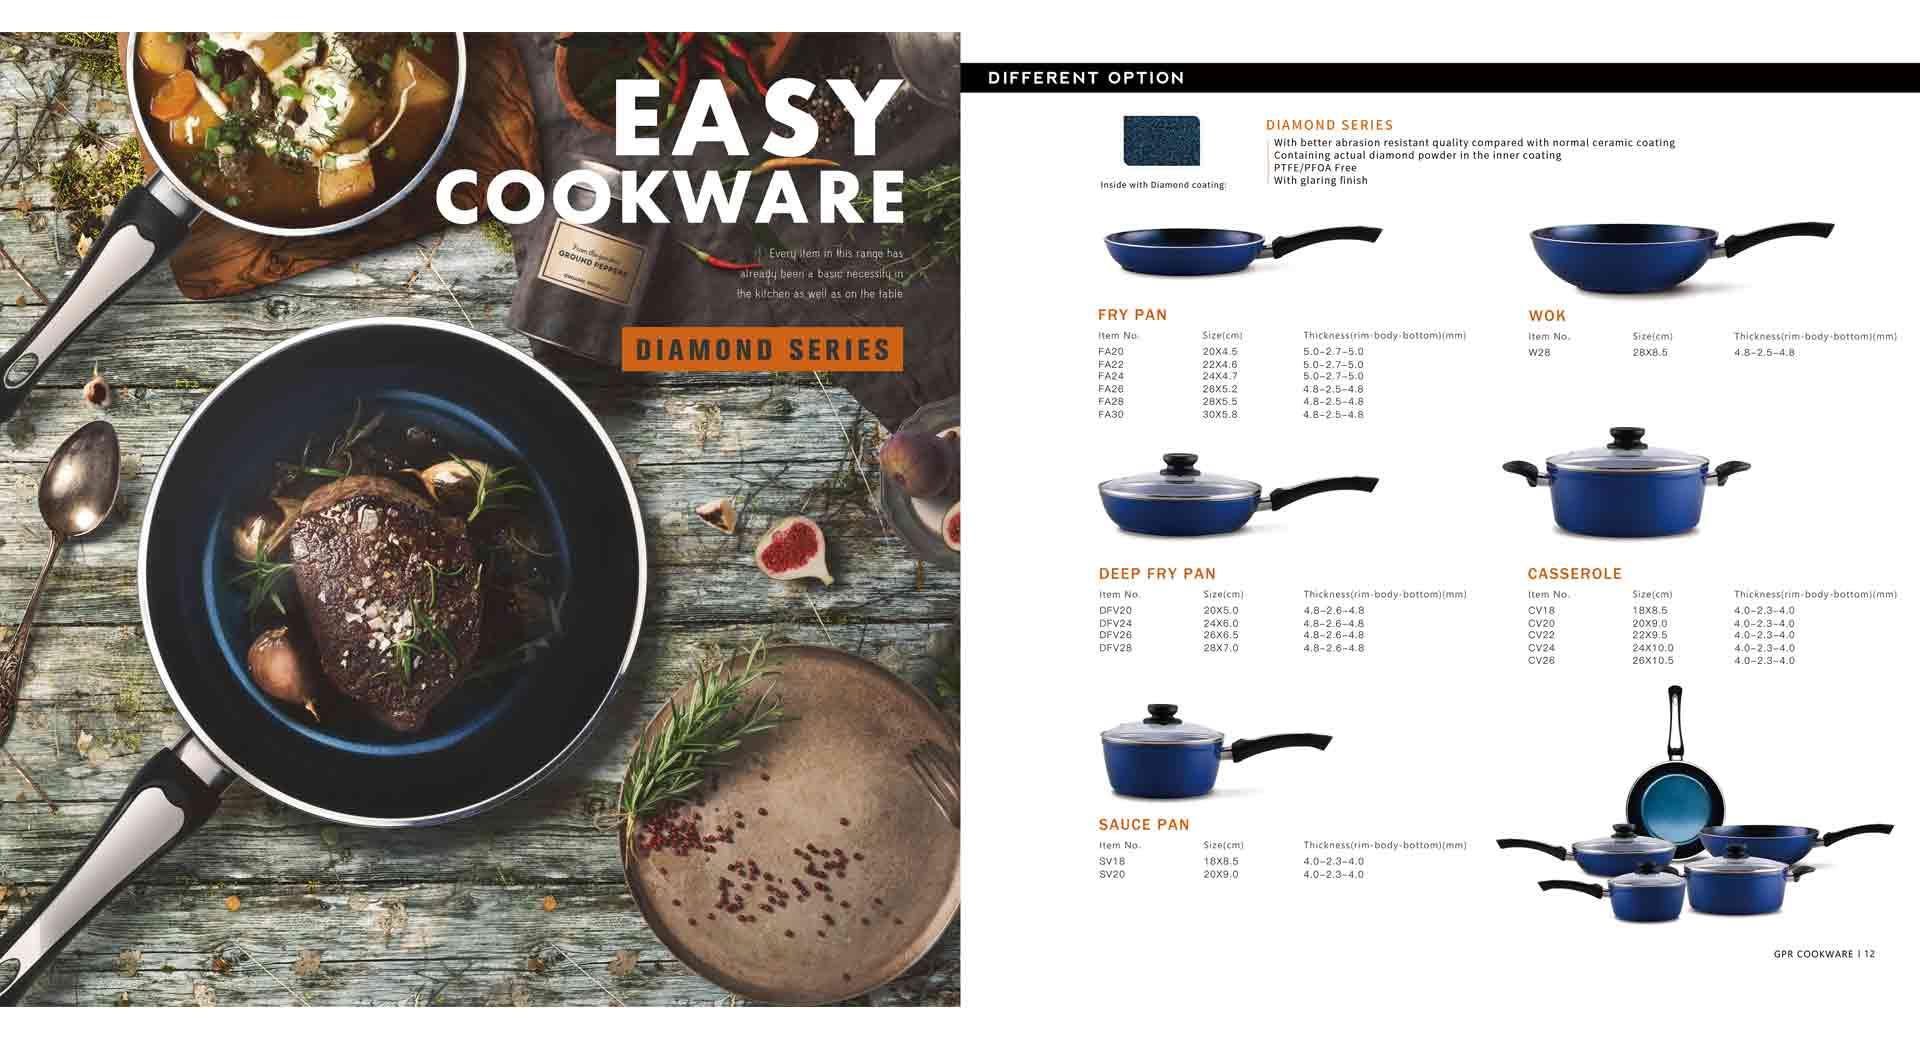 Diamond Series Cookware Set